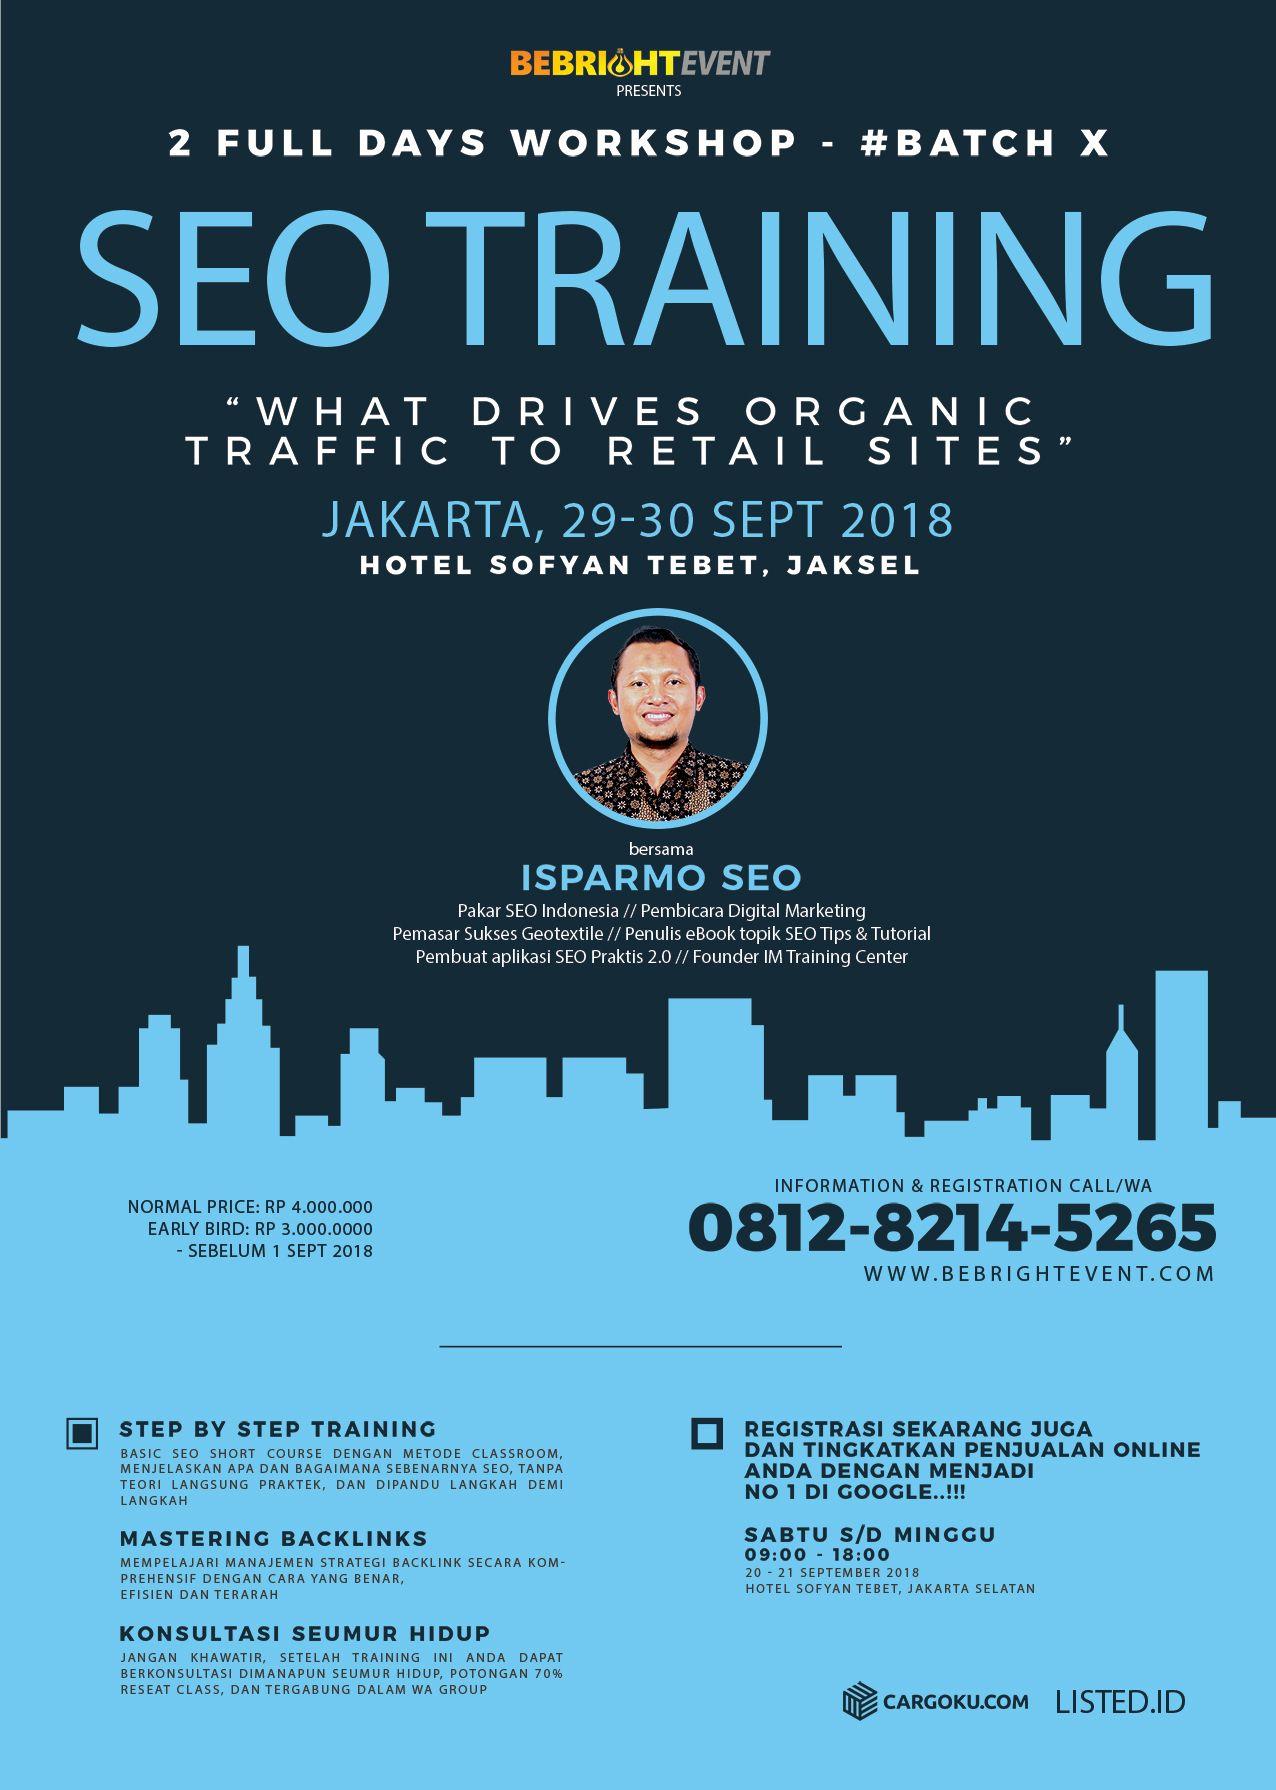 Pin Di 0812 8214 5265 Provider Training Digital Marketing